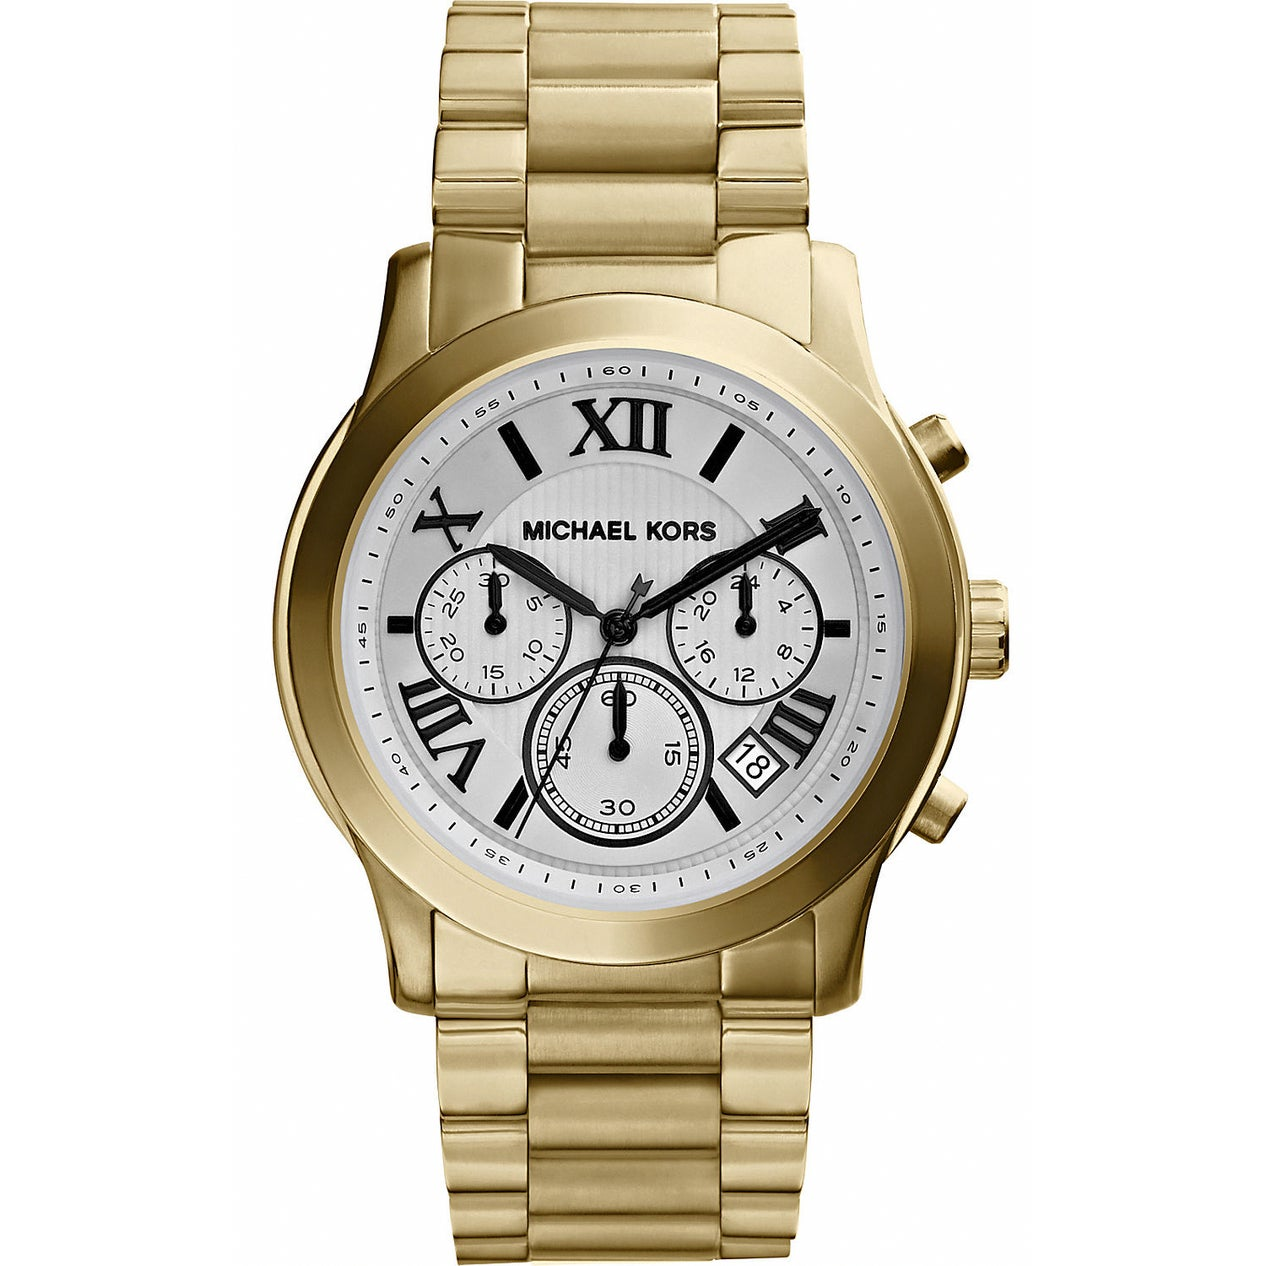 Michael Kors Womens MK5916 Cooper Goldtone Tone Chronograph Watch Womens MK5916 Cooper Gold Tone Chronograph Watch